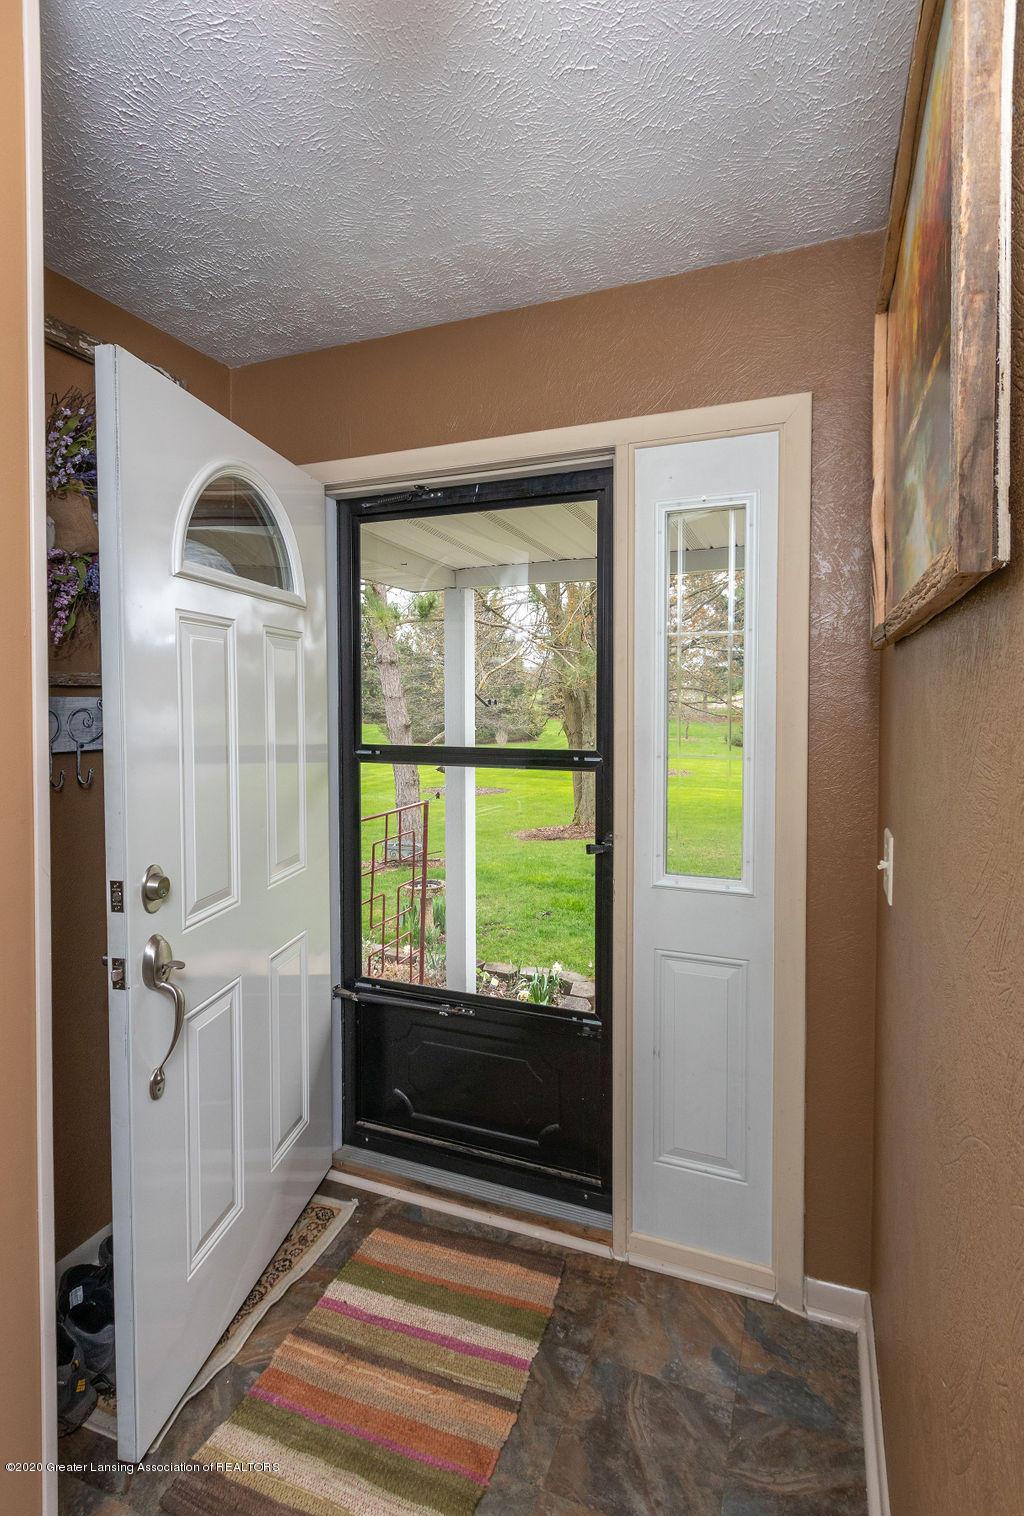 6090 Standish Court, East Lansing, MI 48823, 5 Bedrooms Bedrooms, ,5 BathroomsBathrooms,Residential,For Sale,Standish,243082